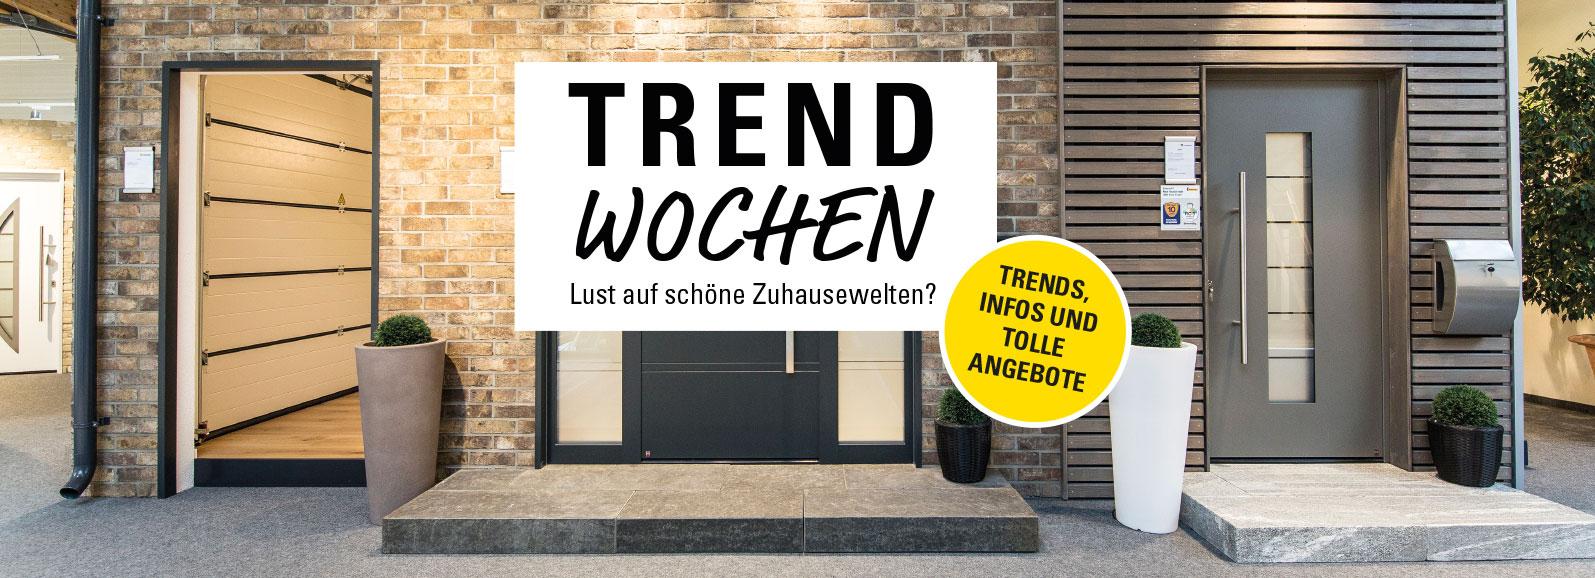 Trendwochen in lemgo linnenbecker gmbh baustoffhandel - Fliesenhandel berlin ...